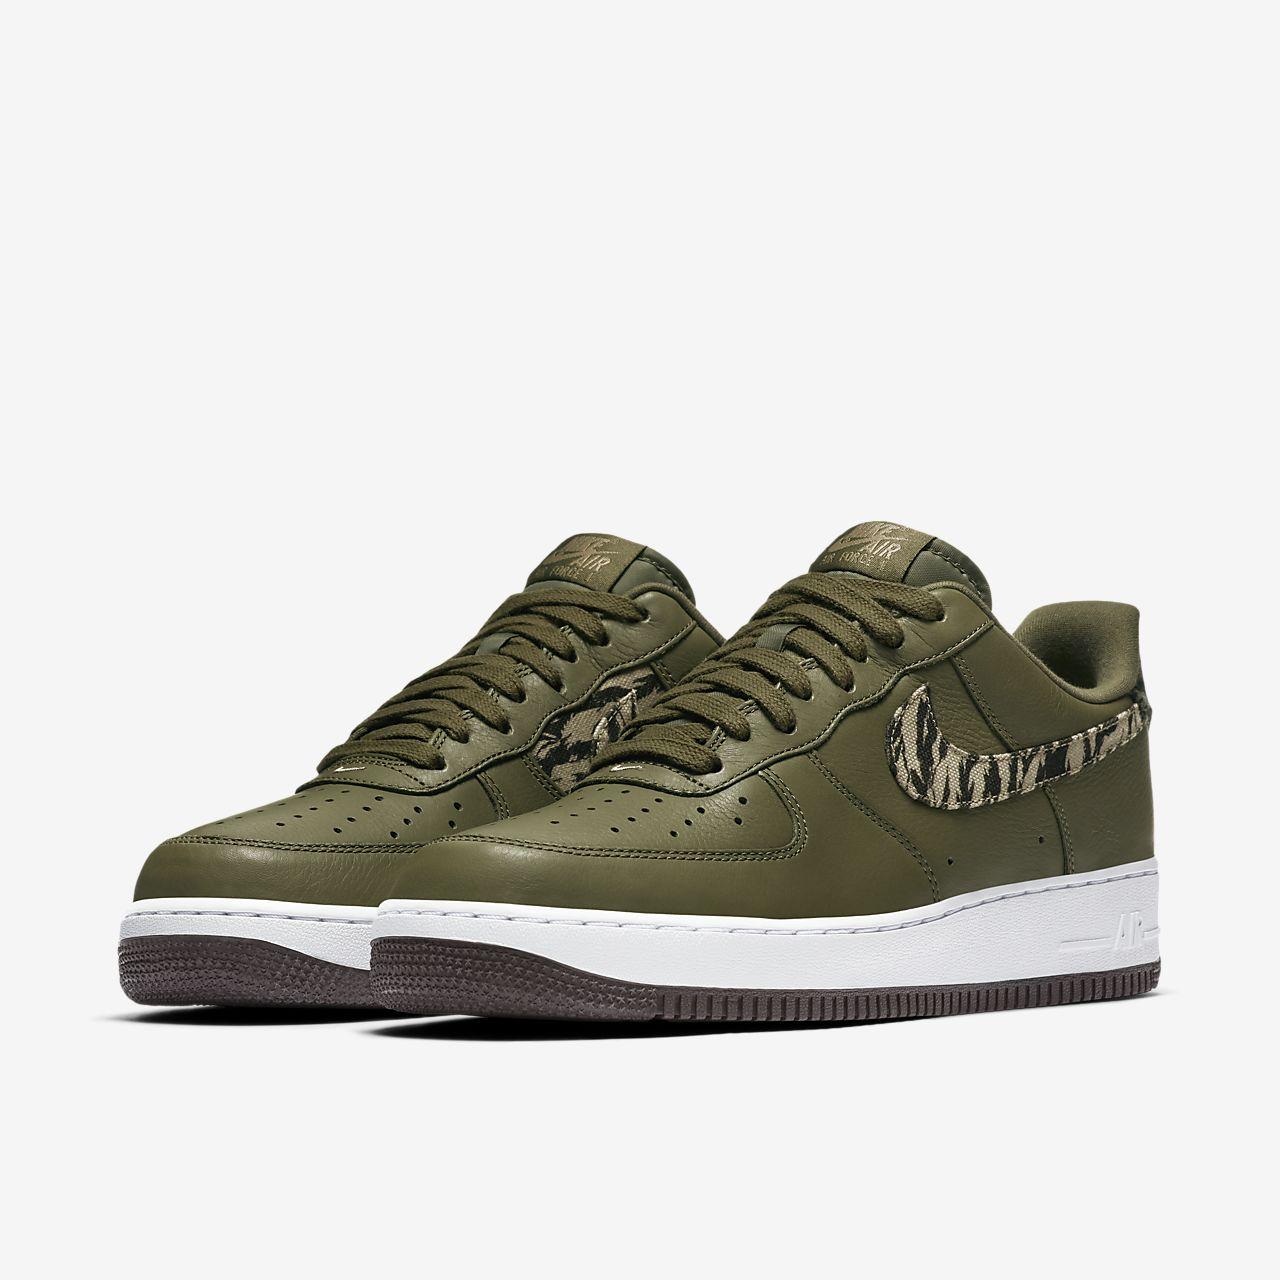 ... Chaussure Nike Air Force 1 Premium pour Homme